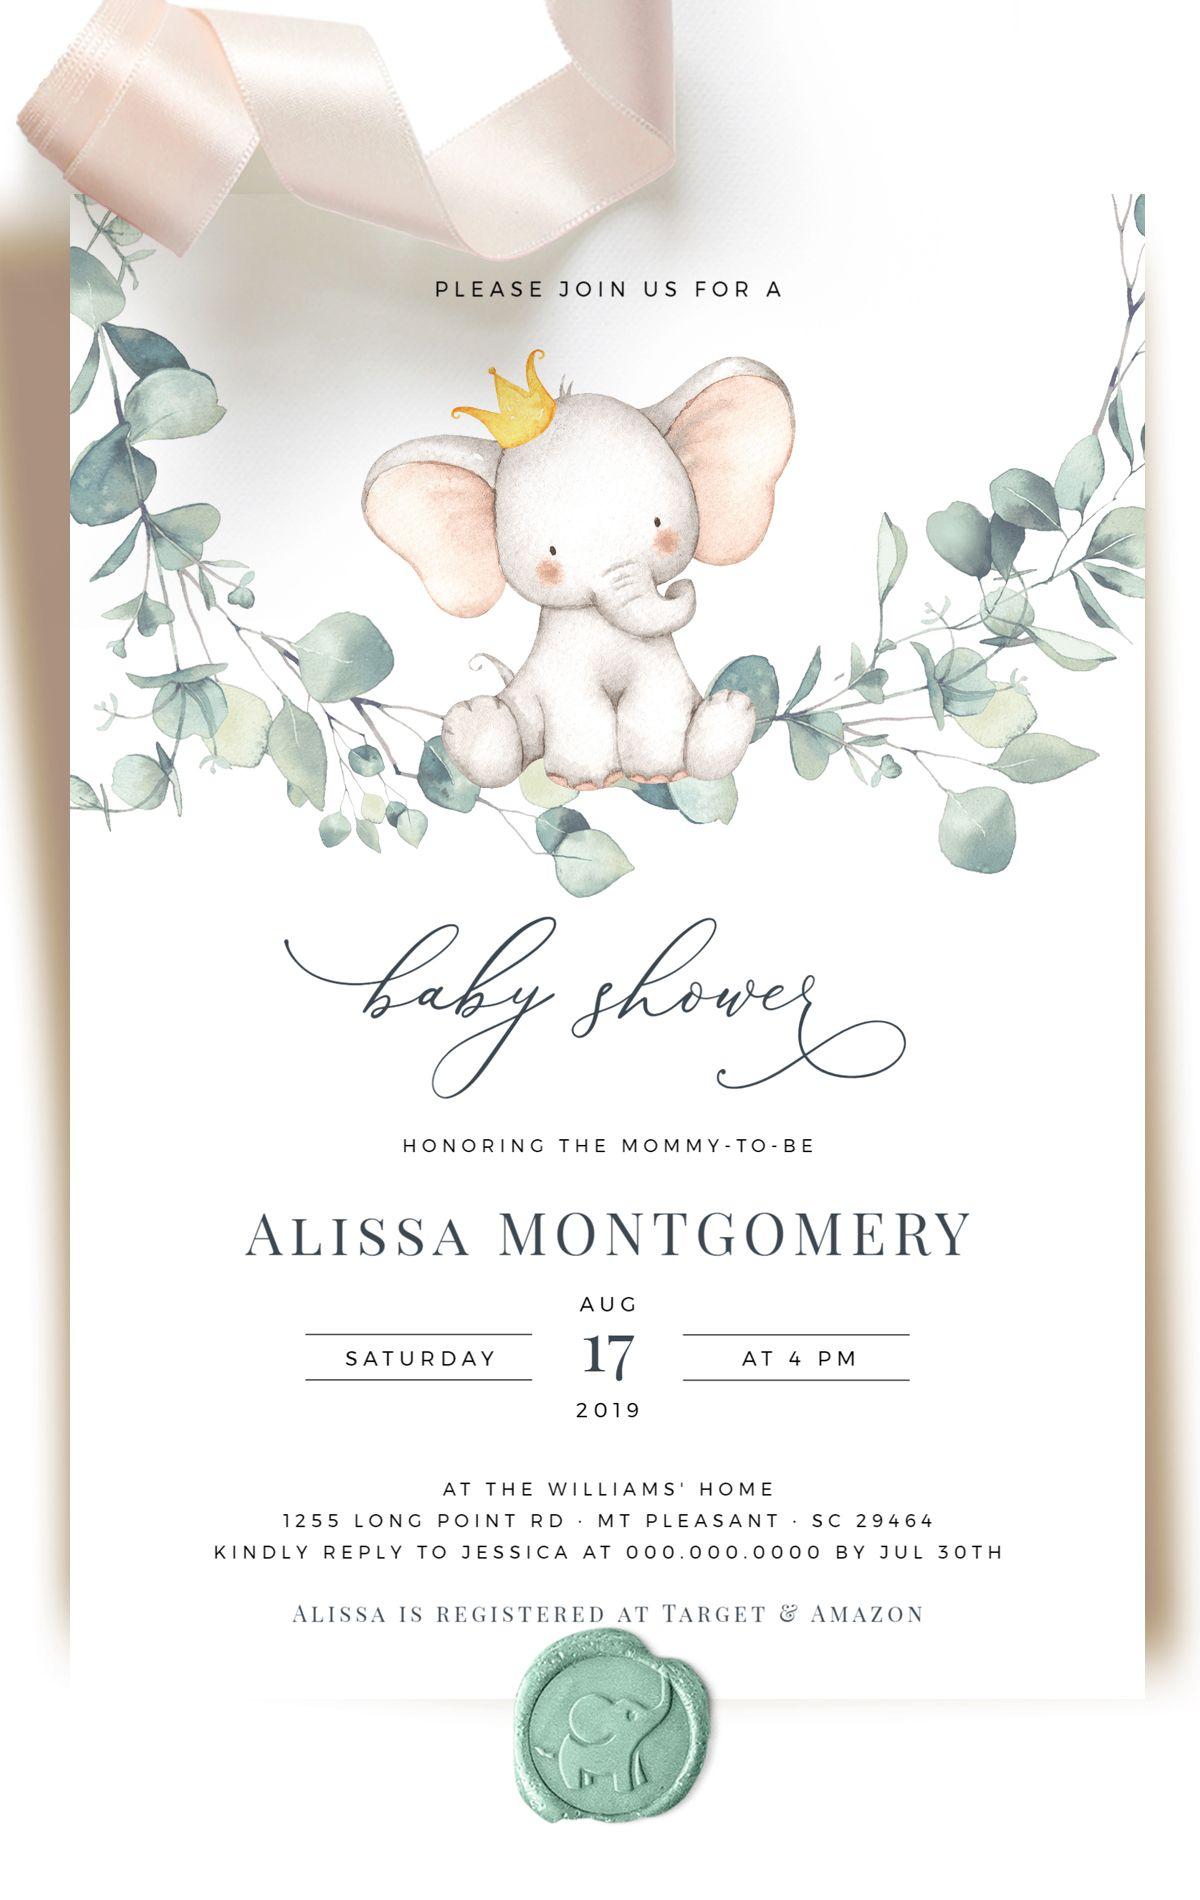 Eucalyptus Baby Shower Invitation Gender Neutral Baby Shower Invitations Baby Shower Invites Neutral Baby Shower Invitation Templates